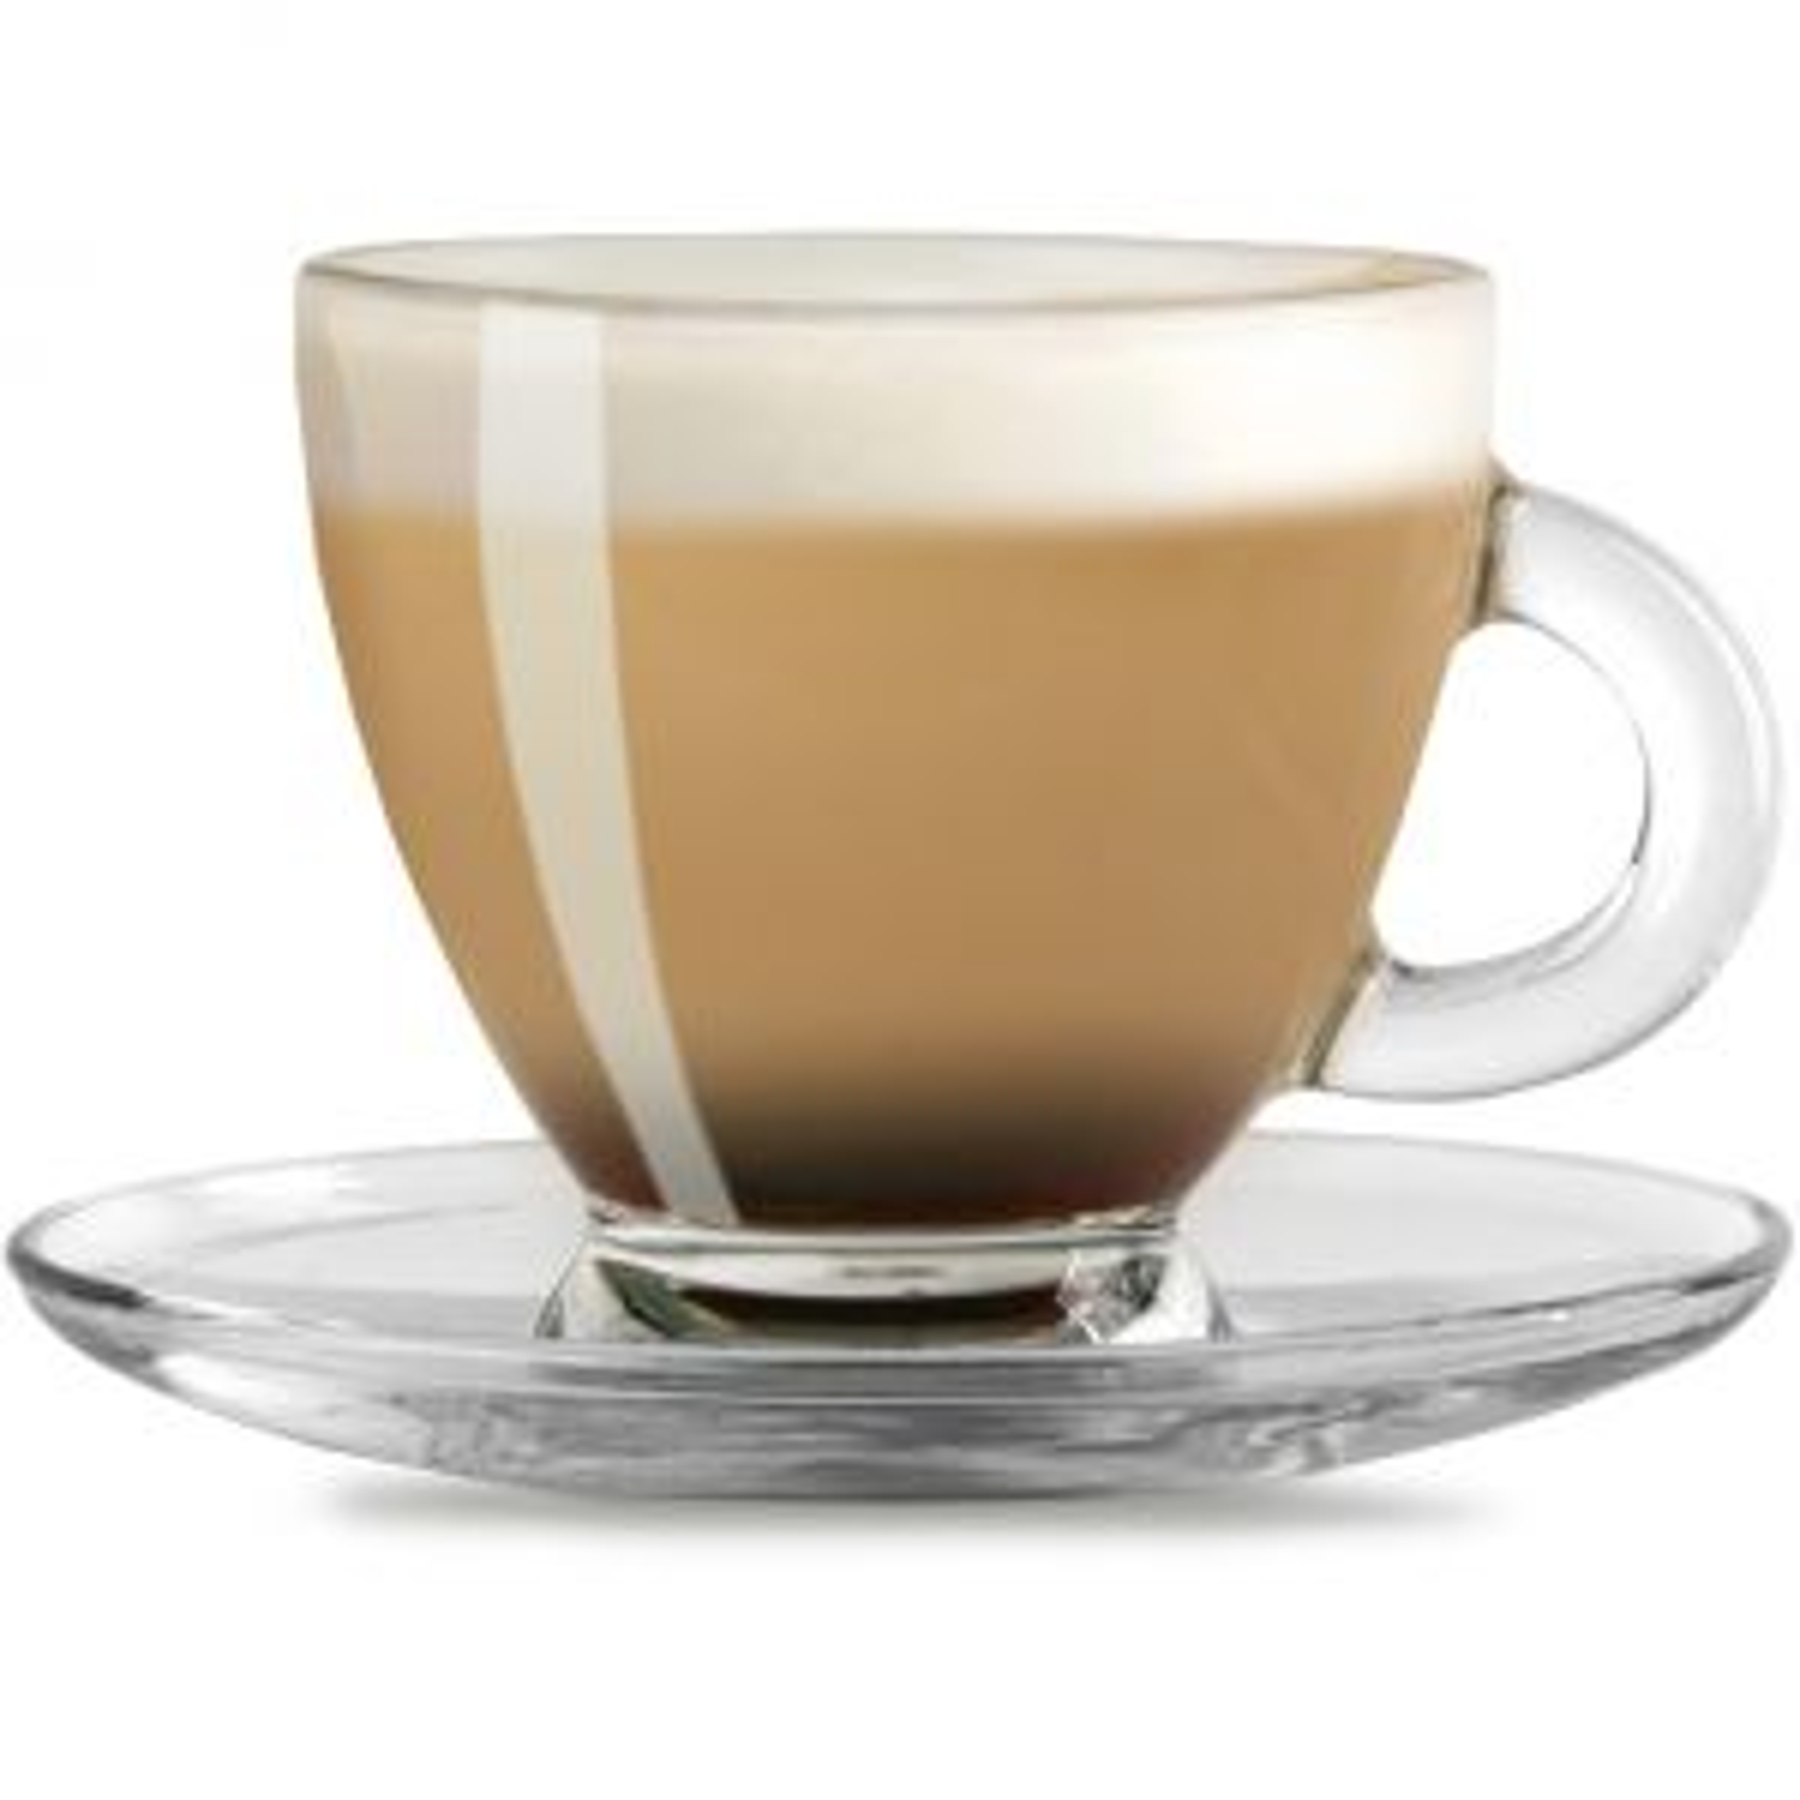 Skoddejuice Cappuccino Aroma